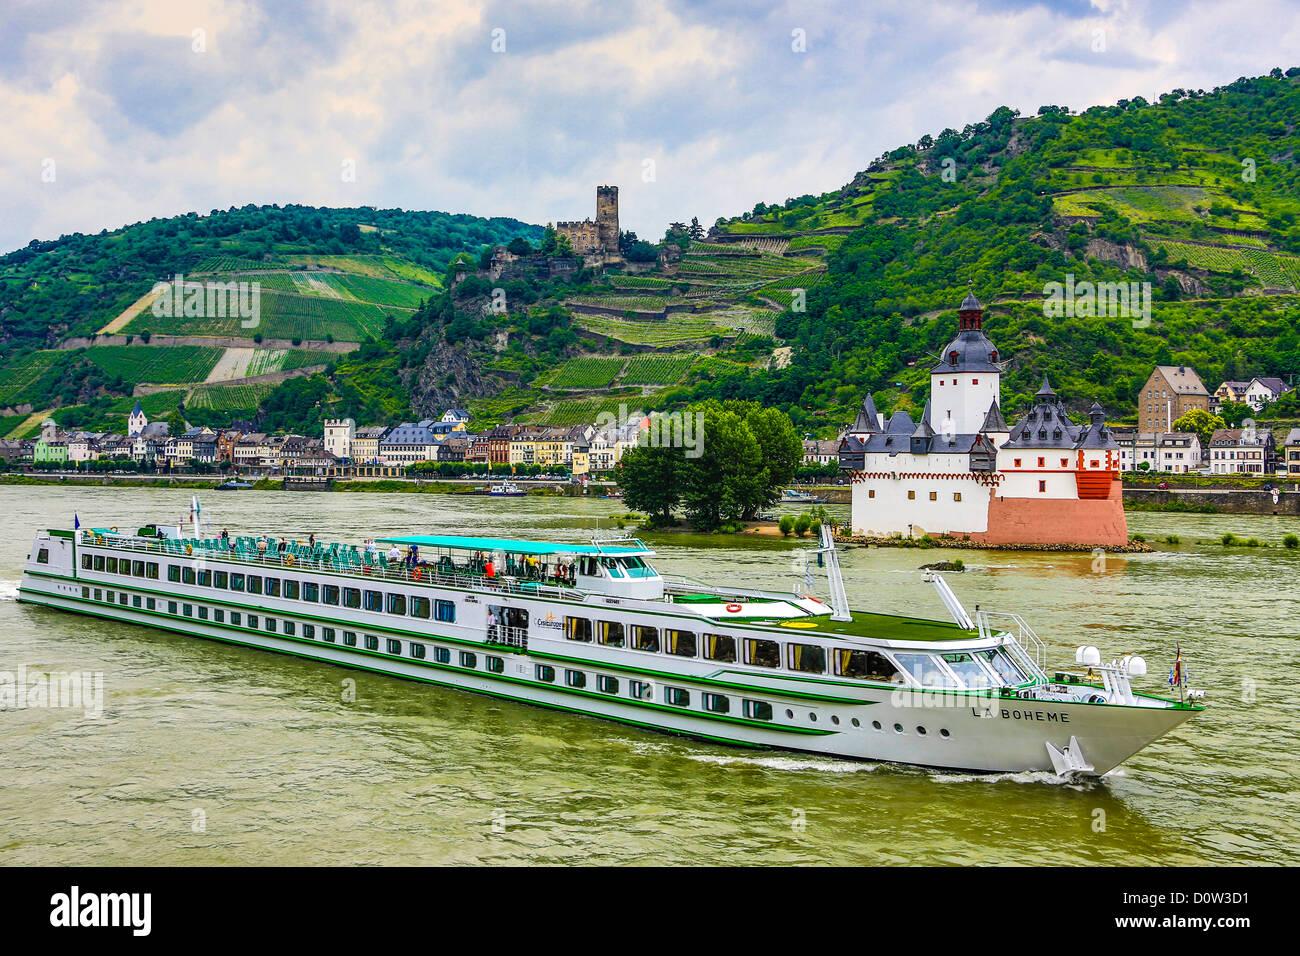 Germany, Europe, travel, Rhein, Rhine, valley, river, Pfalz bei Kaub, castle, Gutenfels, Pfalz, agriculture, bend, Stock Photo